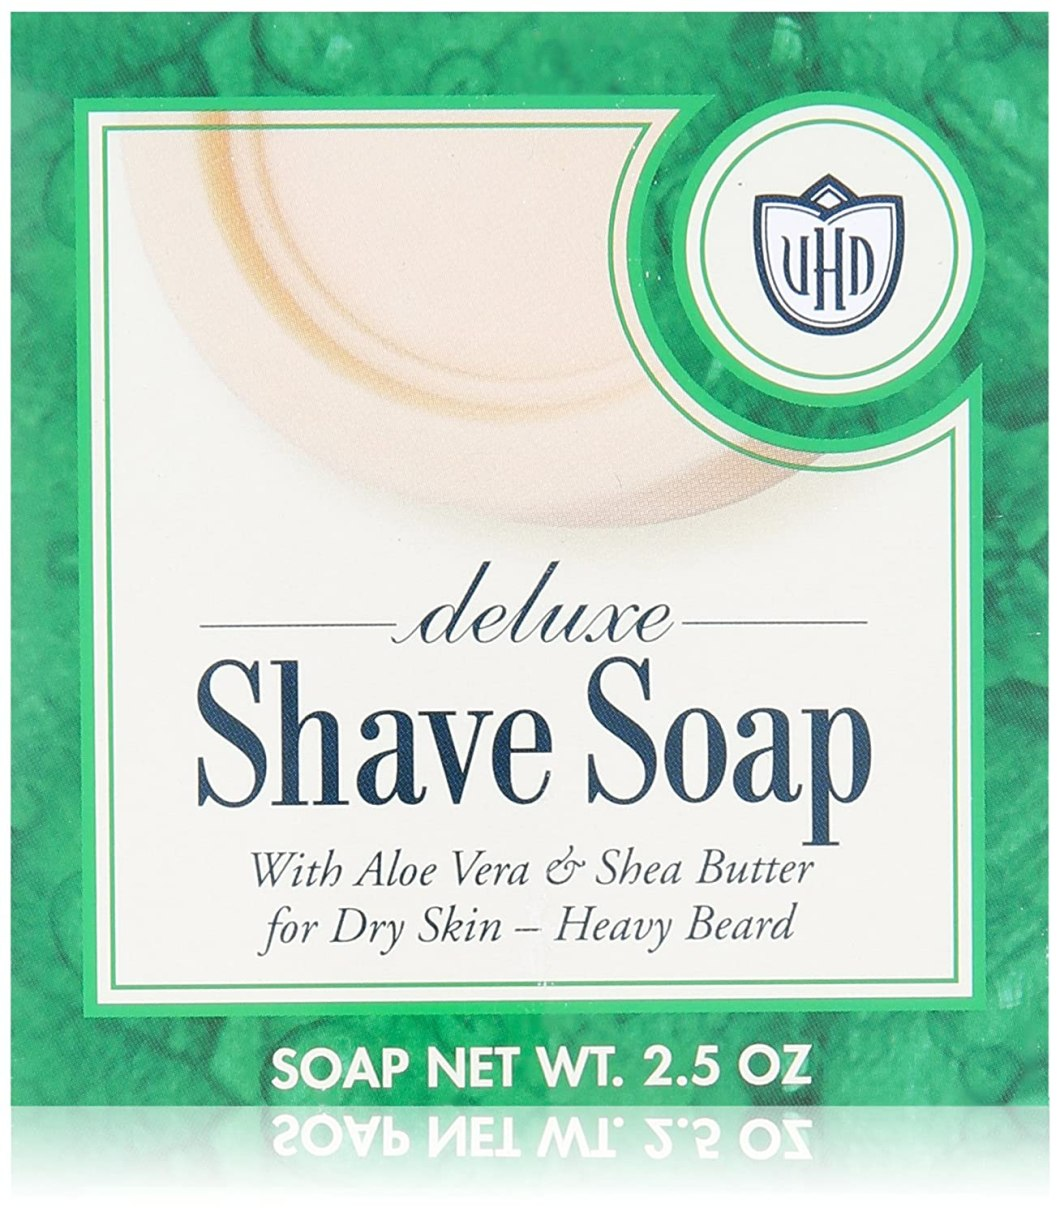 Top 10 Best Shaving Soap For Sensitive Skin Reviews 2018